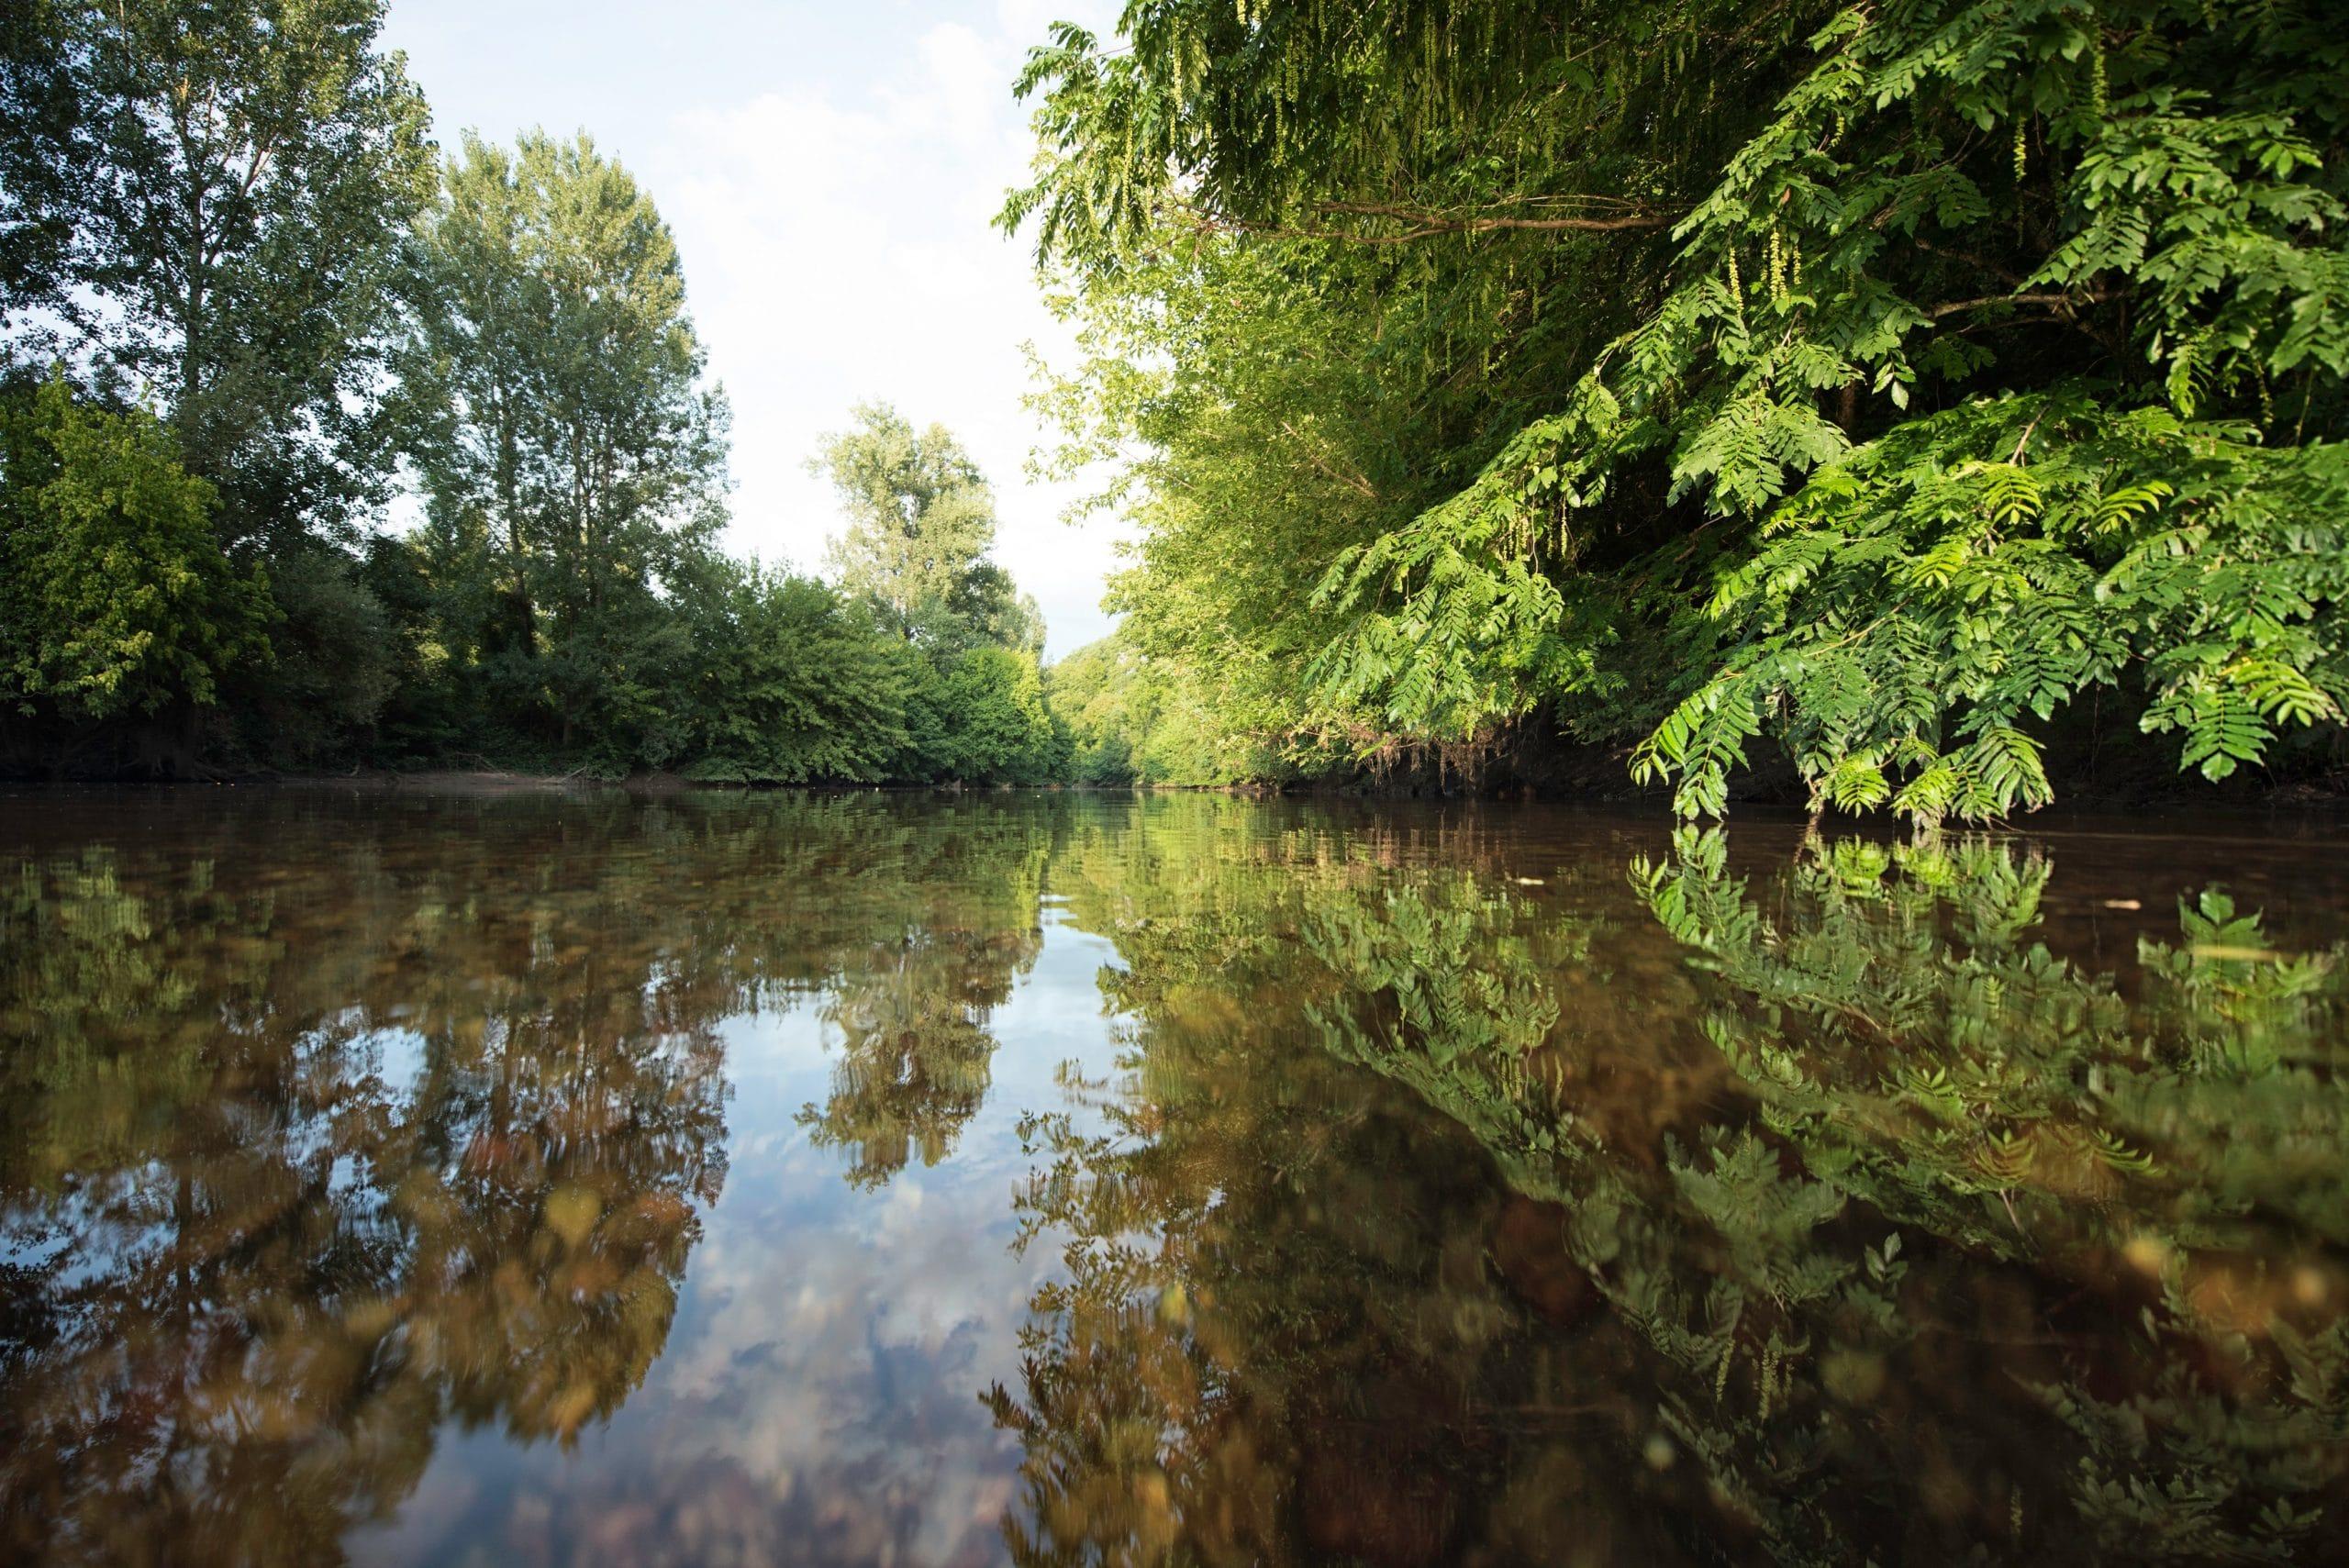 Camping La Dordogne Verte : Dan Seddon Btbk3t2ziv8 Unsplash